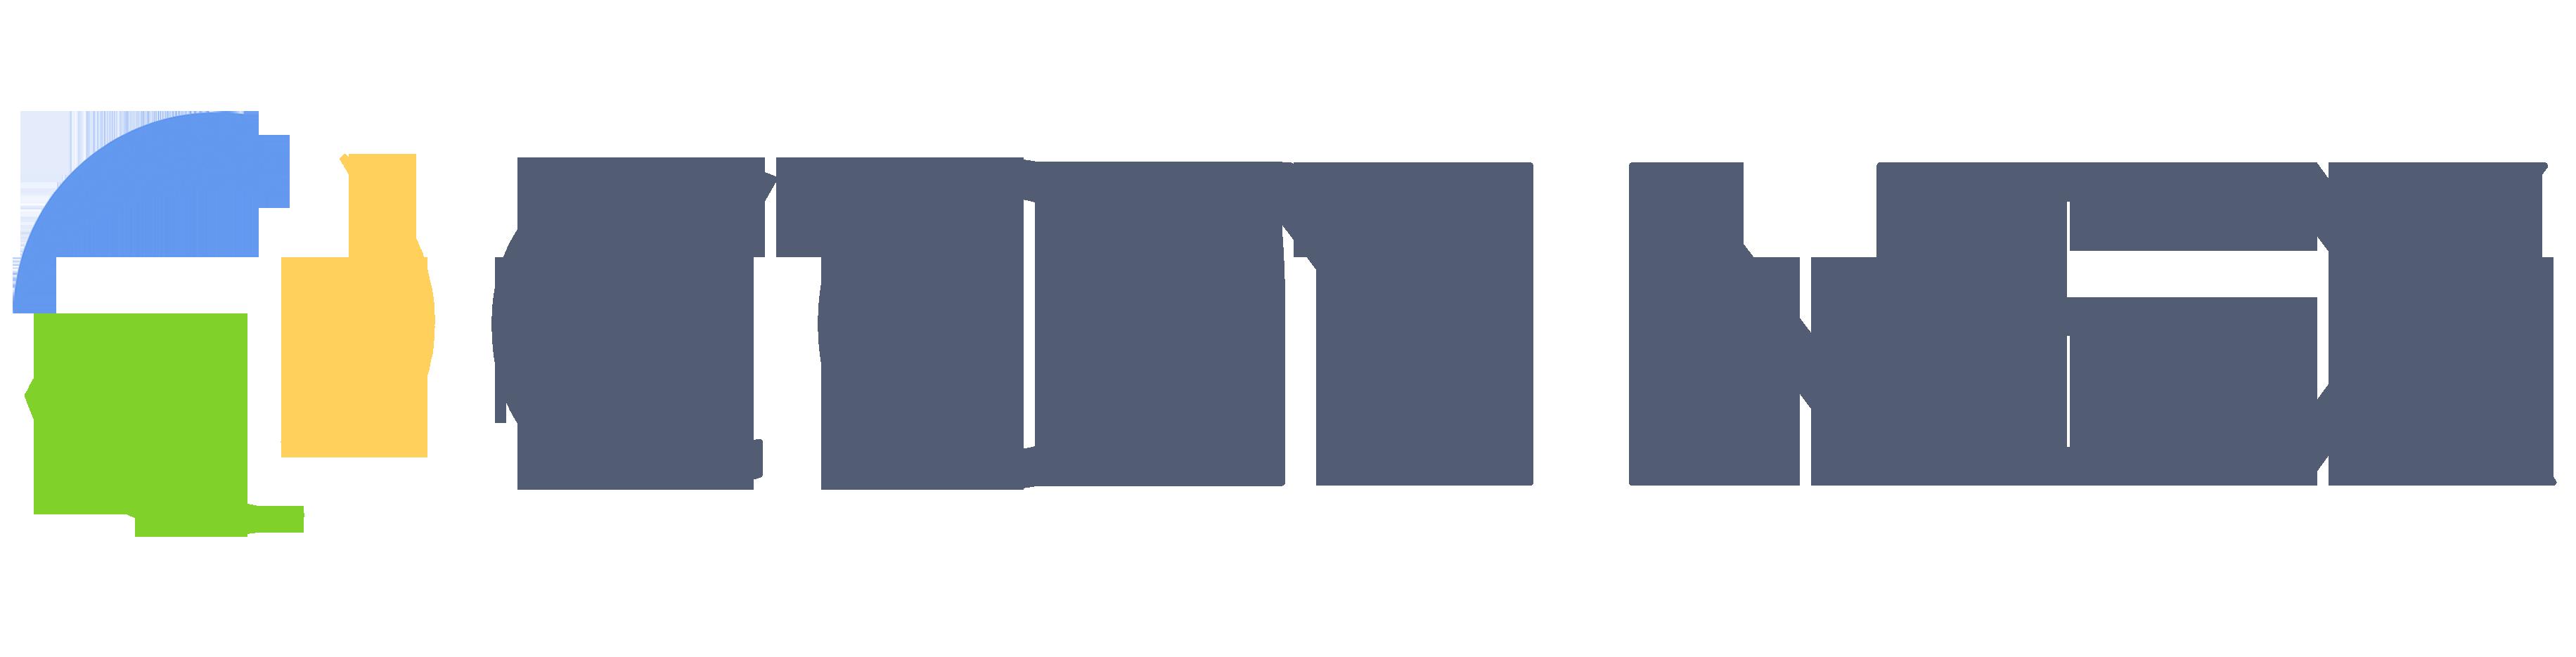 Connex Support